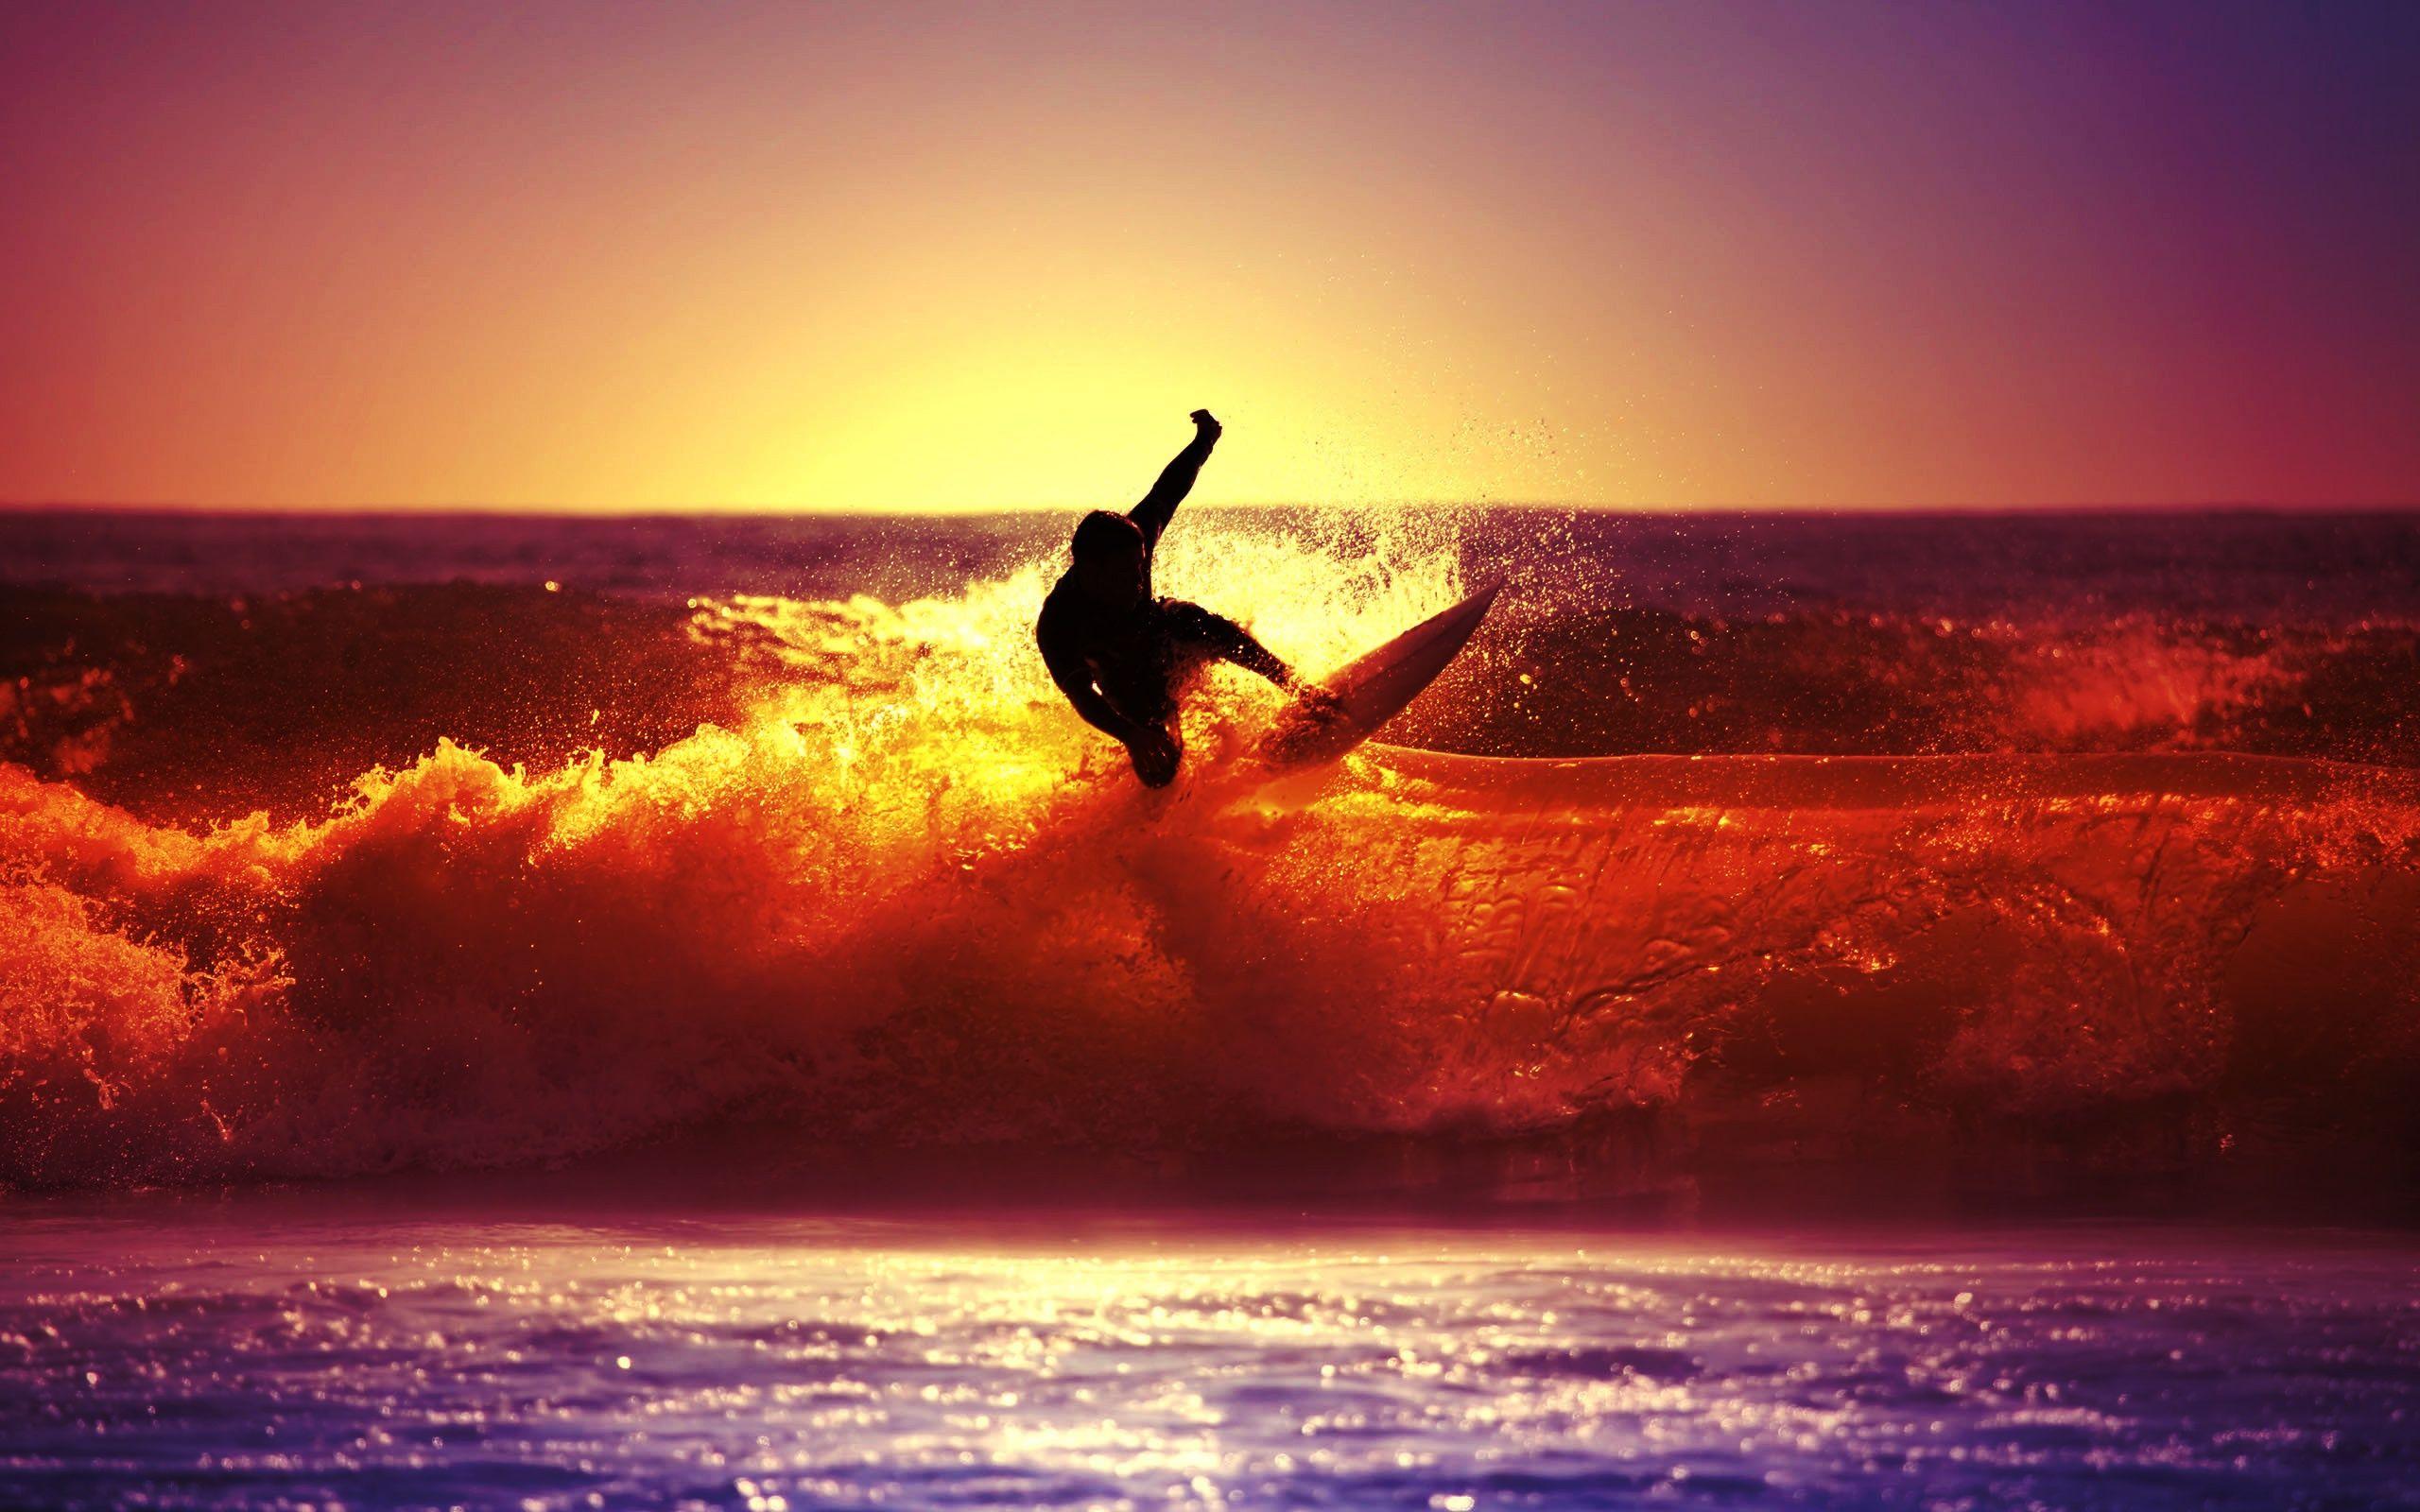 Surfer at sunset photo